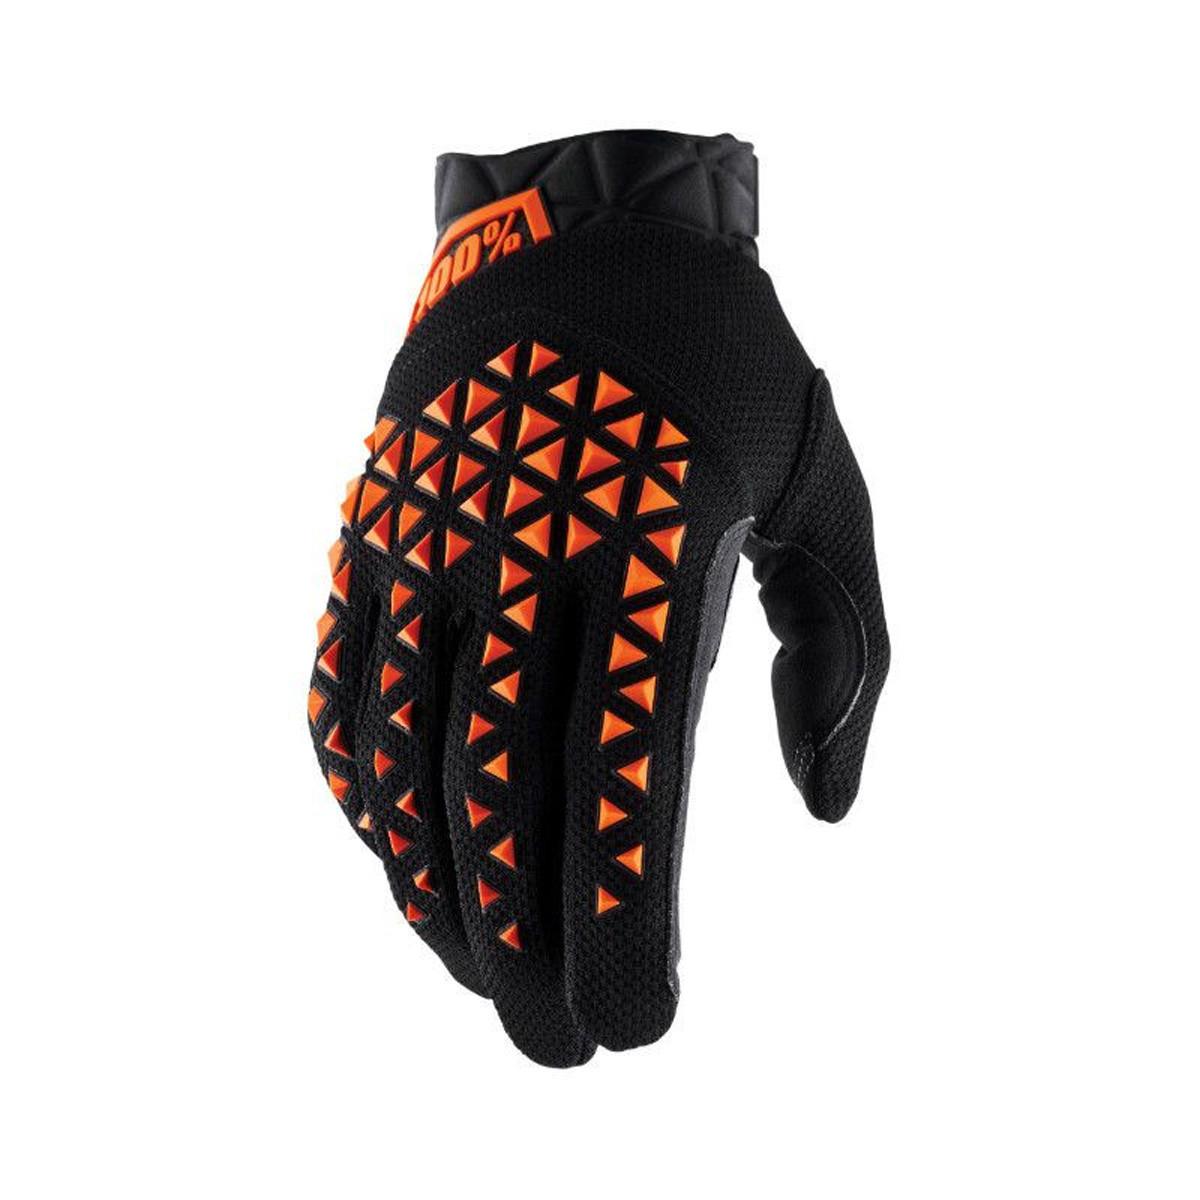 Gants Cross - 100% Airmatic / Noir / Orange